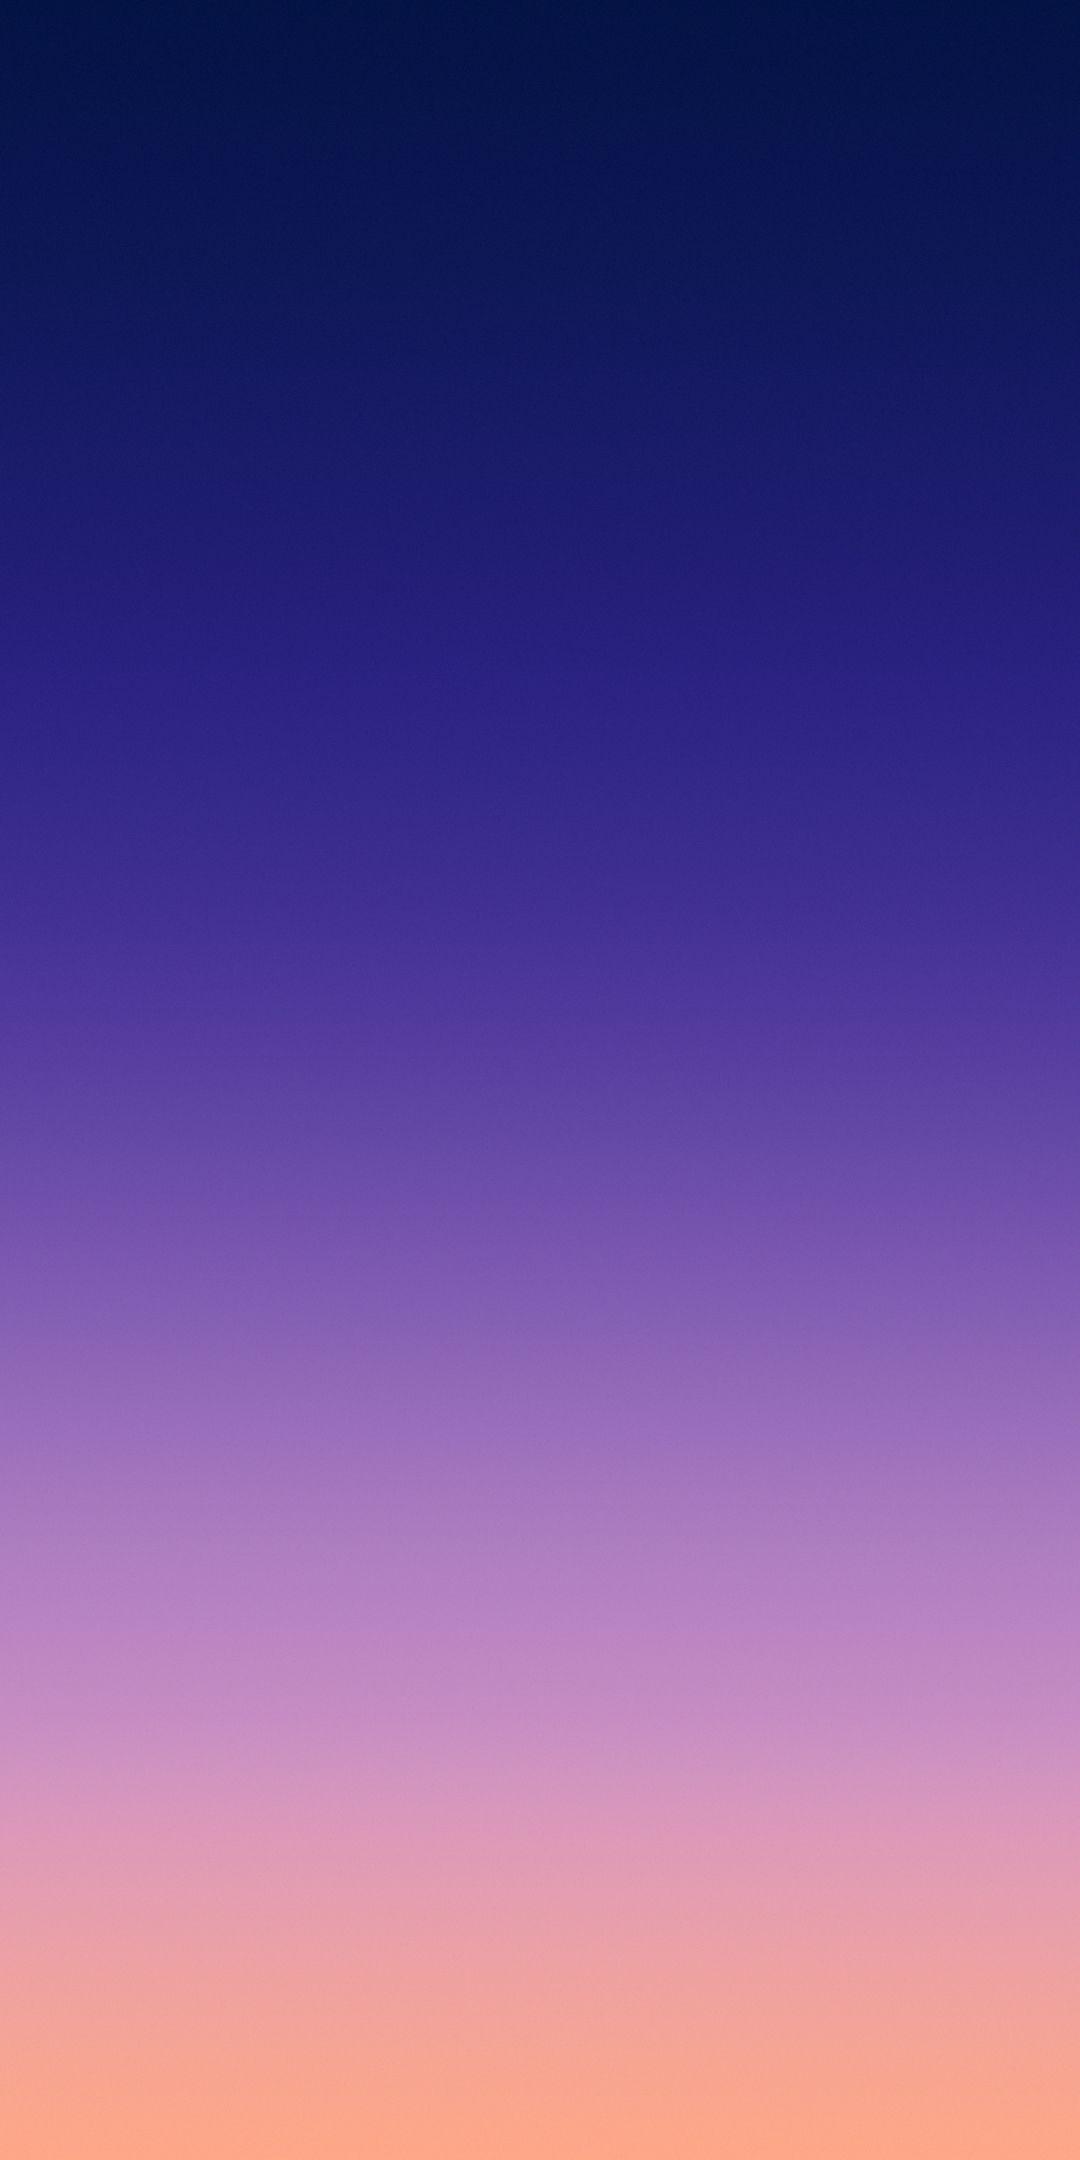 Download Xiaomi Poco X2 Wallpapers Droidviews Plain Wallpaper Iphone Dark Wallpaper Iphone Dark Wallpaper